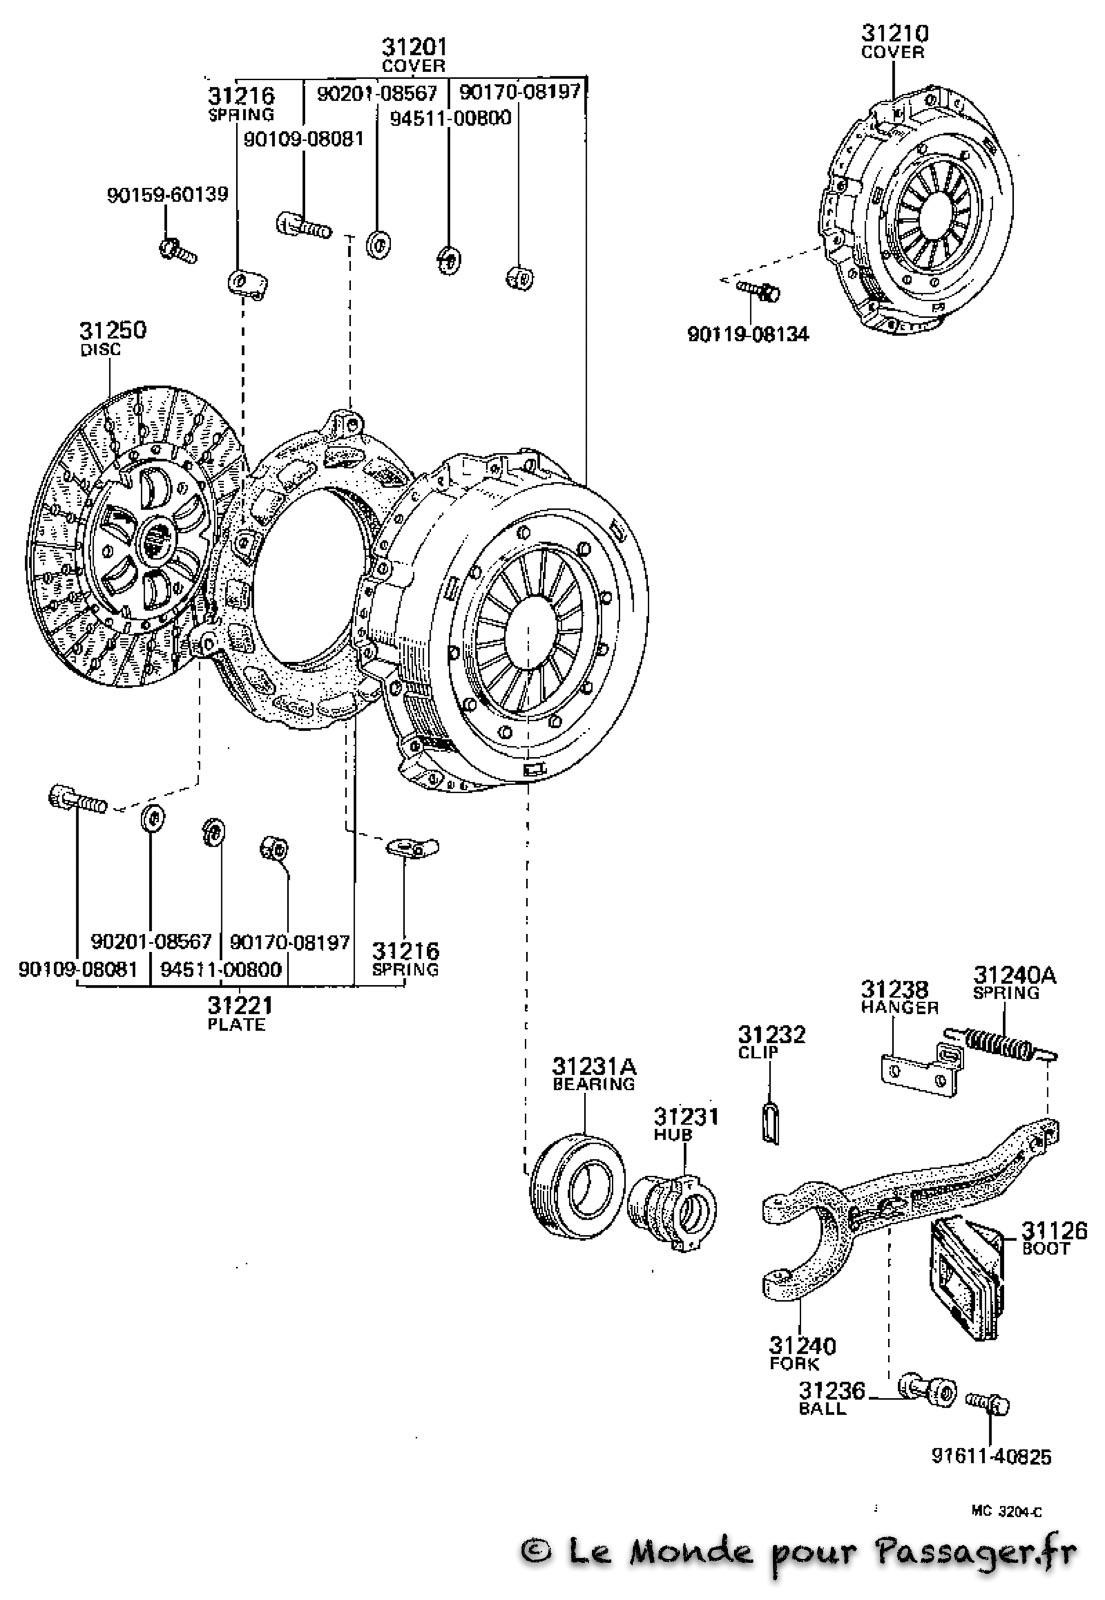 Fj55-Eclatés-Techniques129